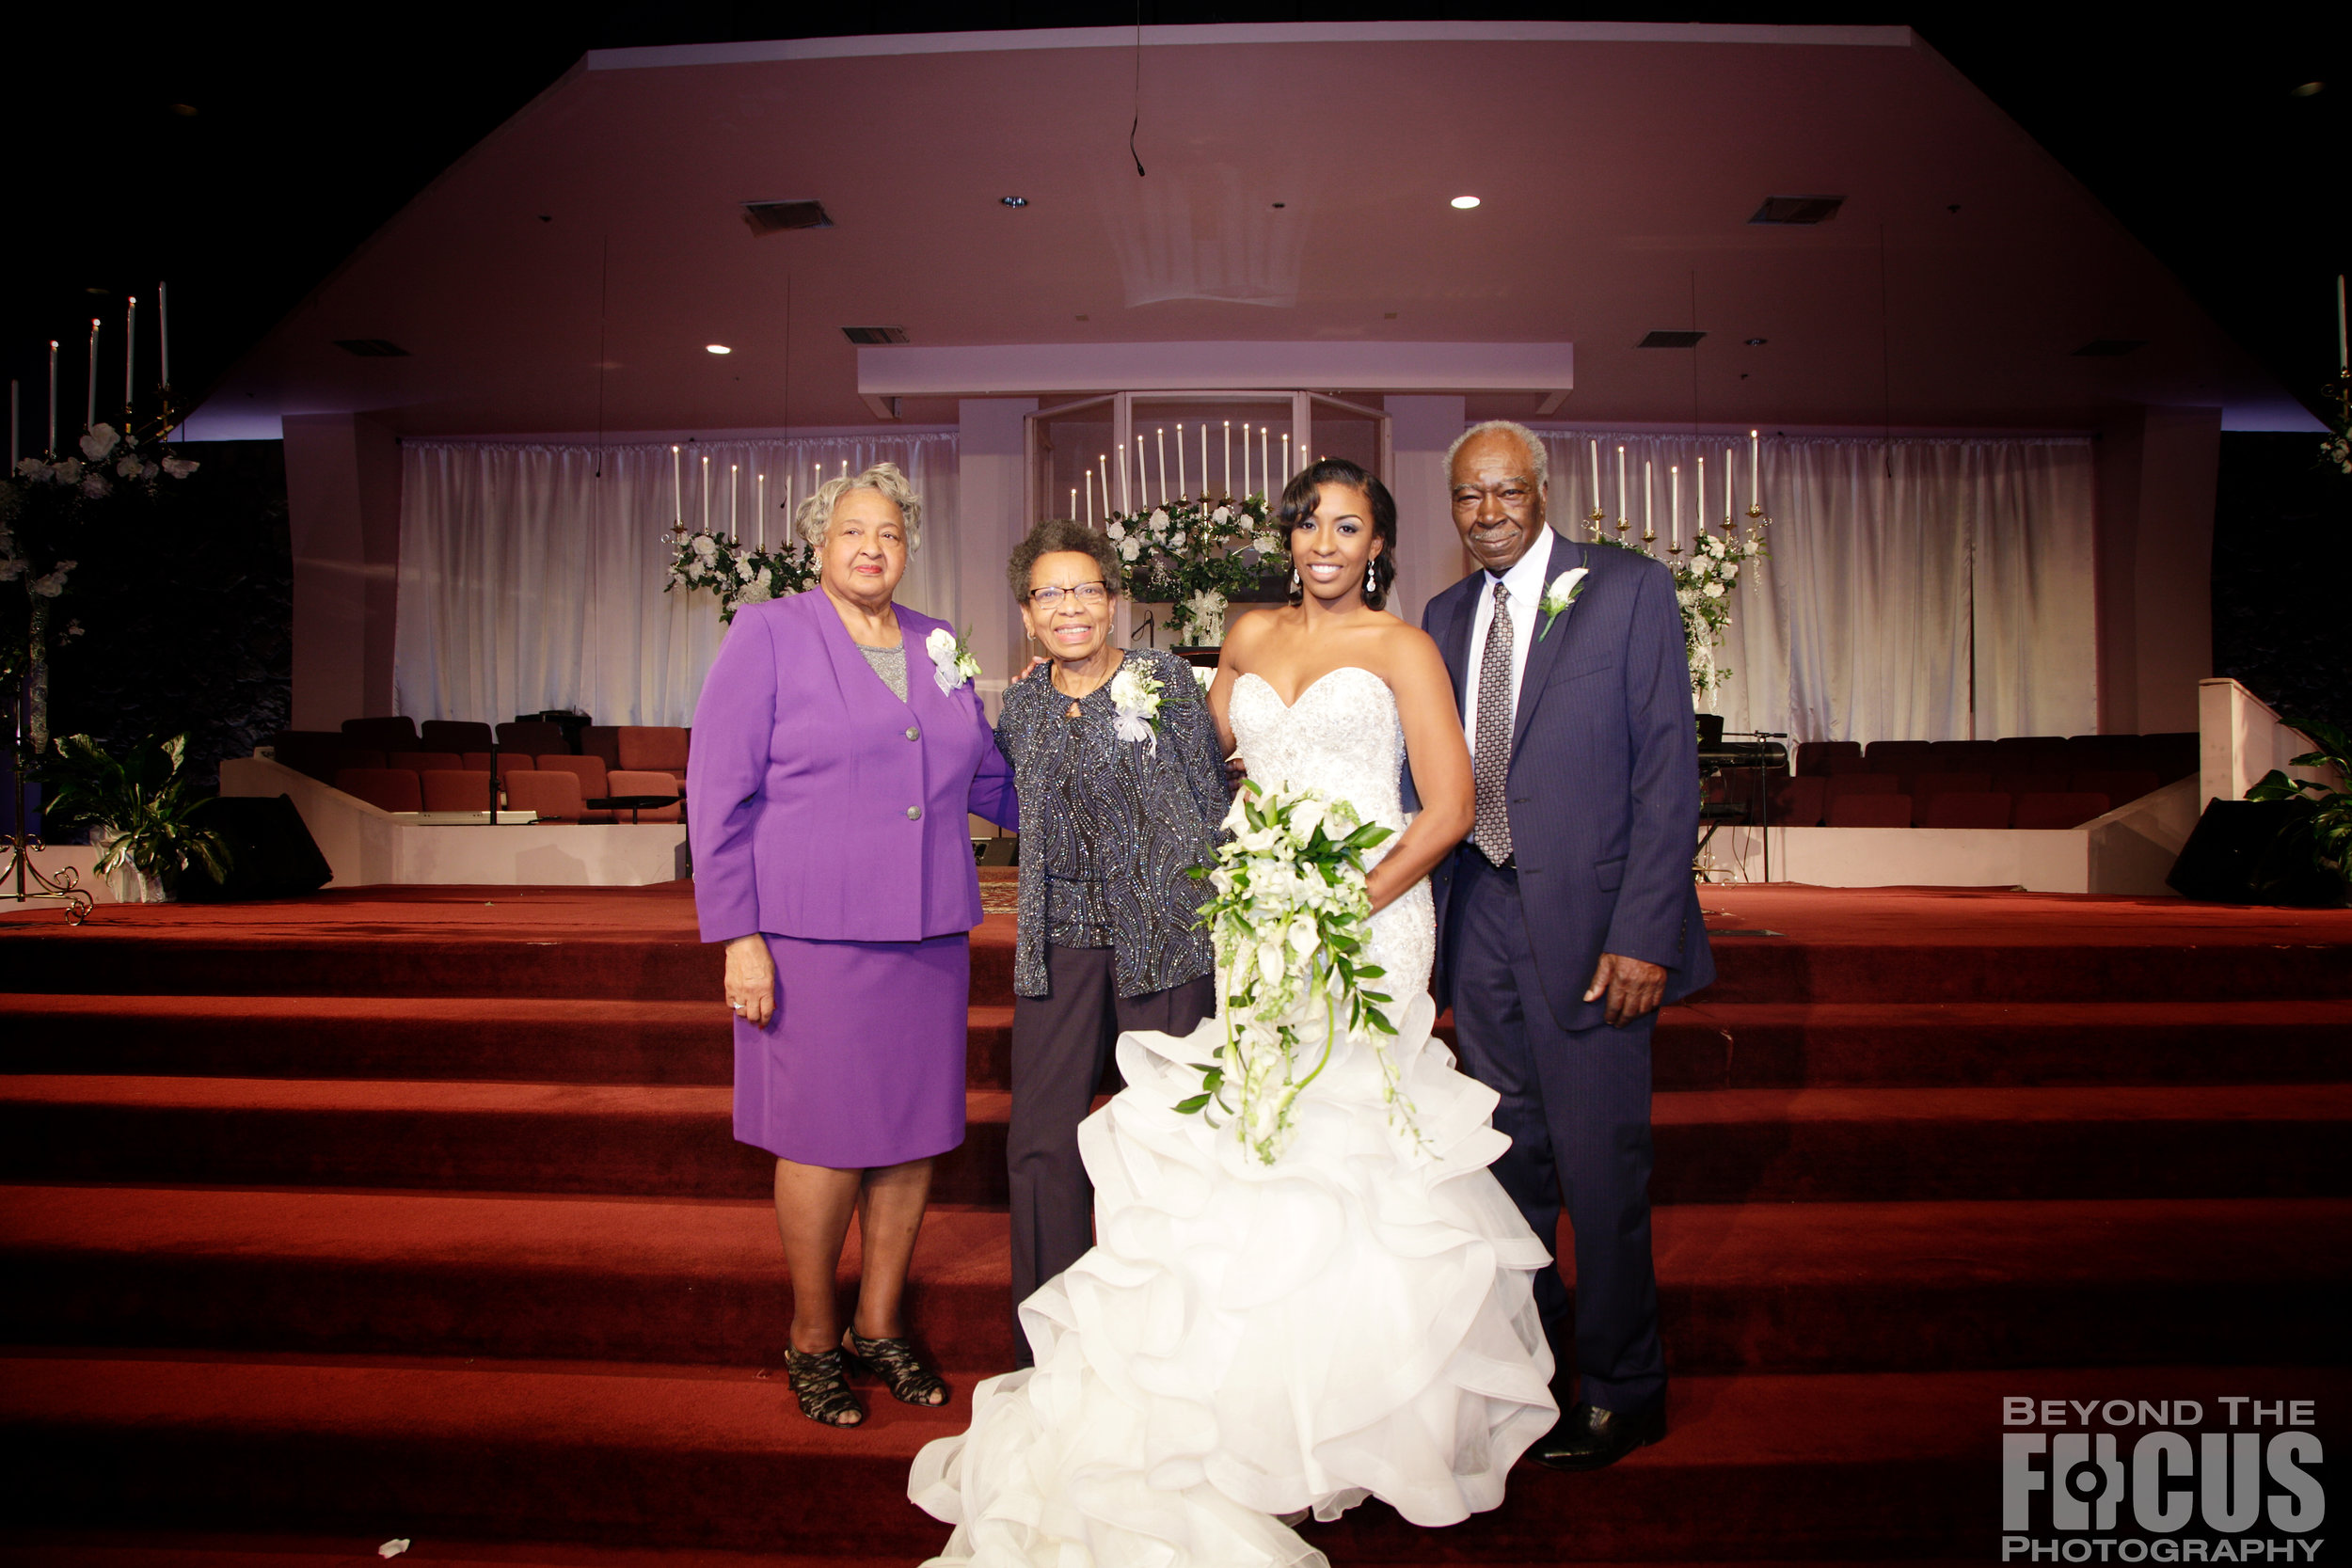 Matthews_Wedding_Ceremony_144.jpg